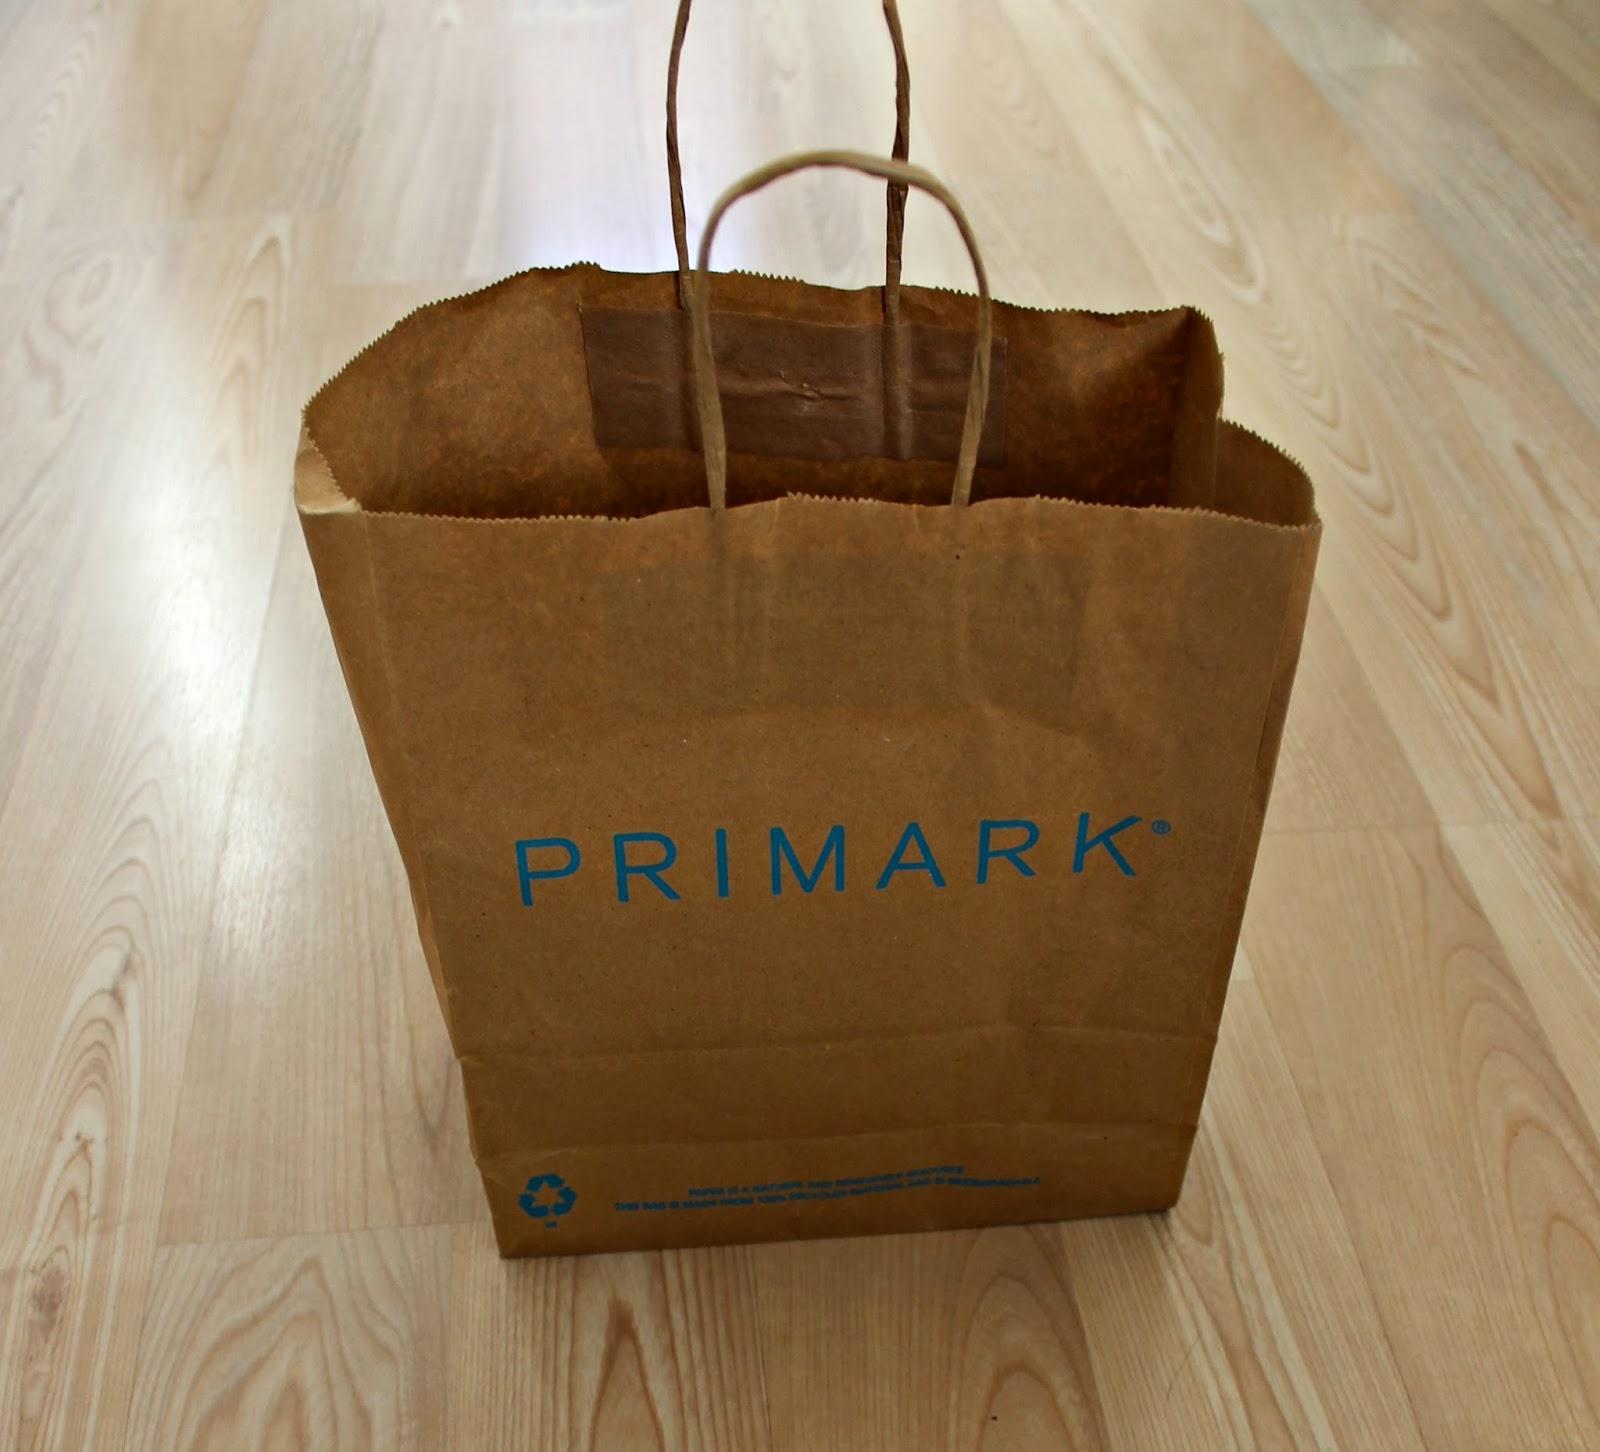 primark - photo #36